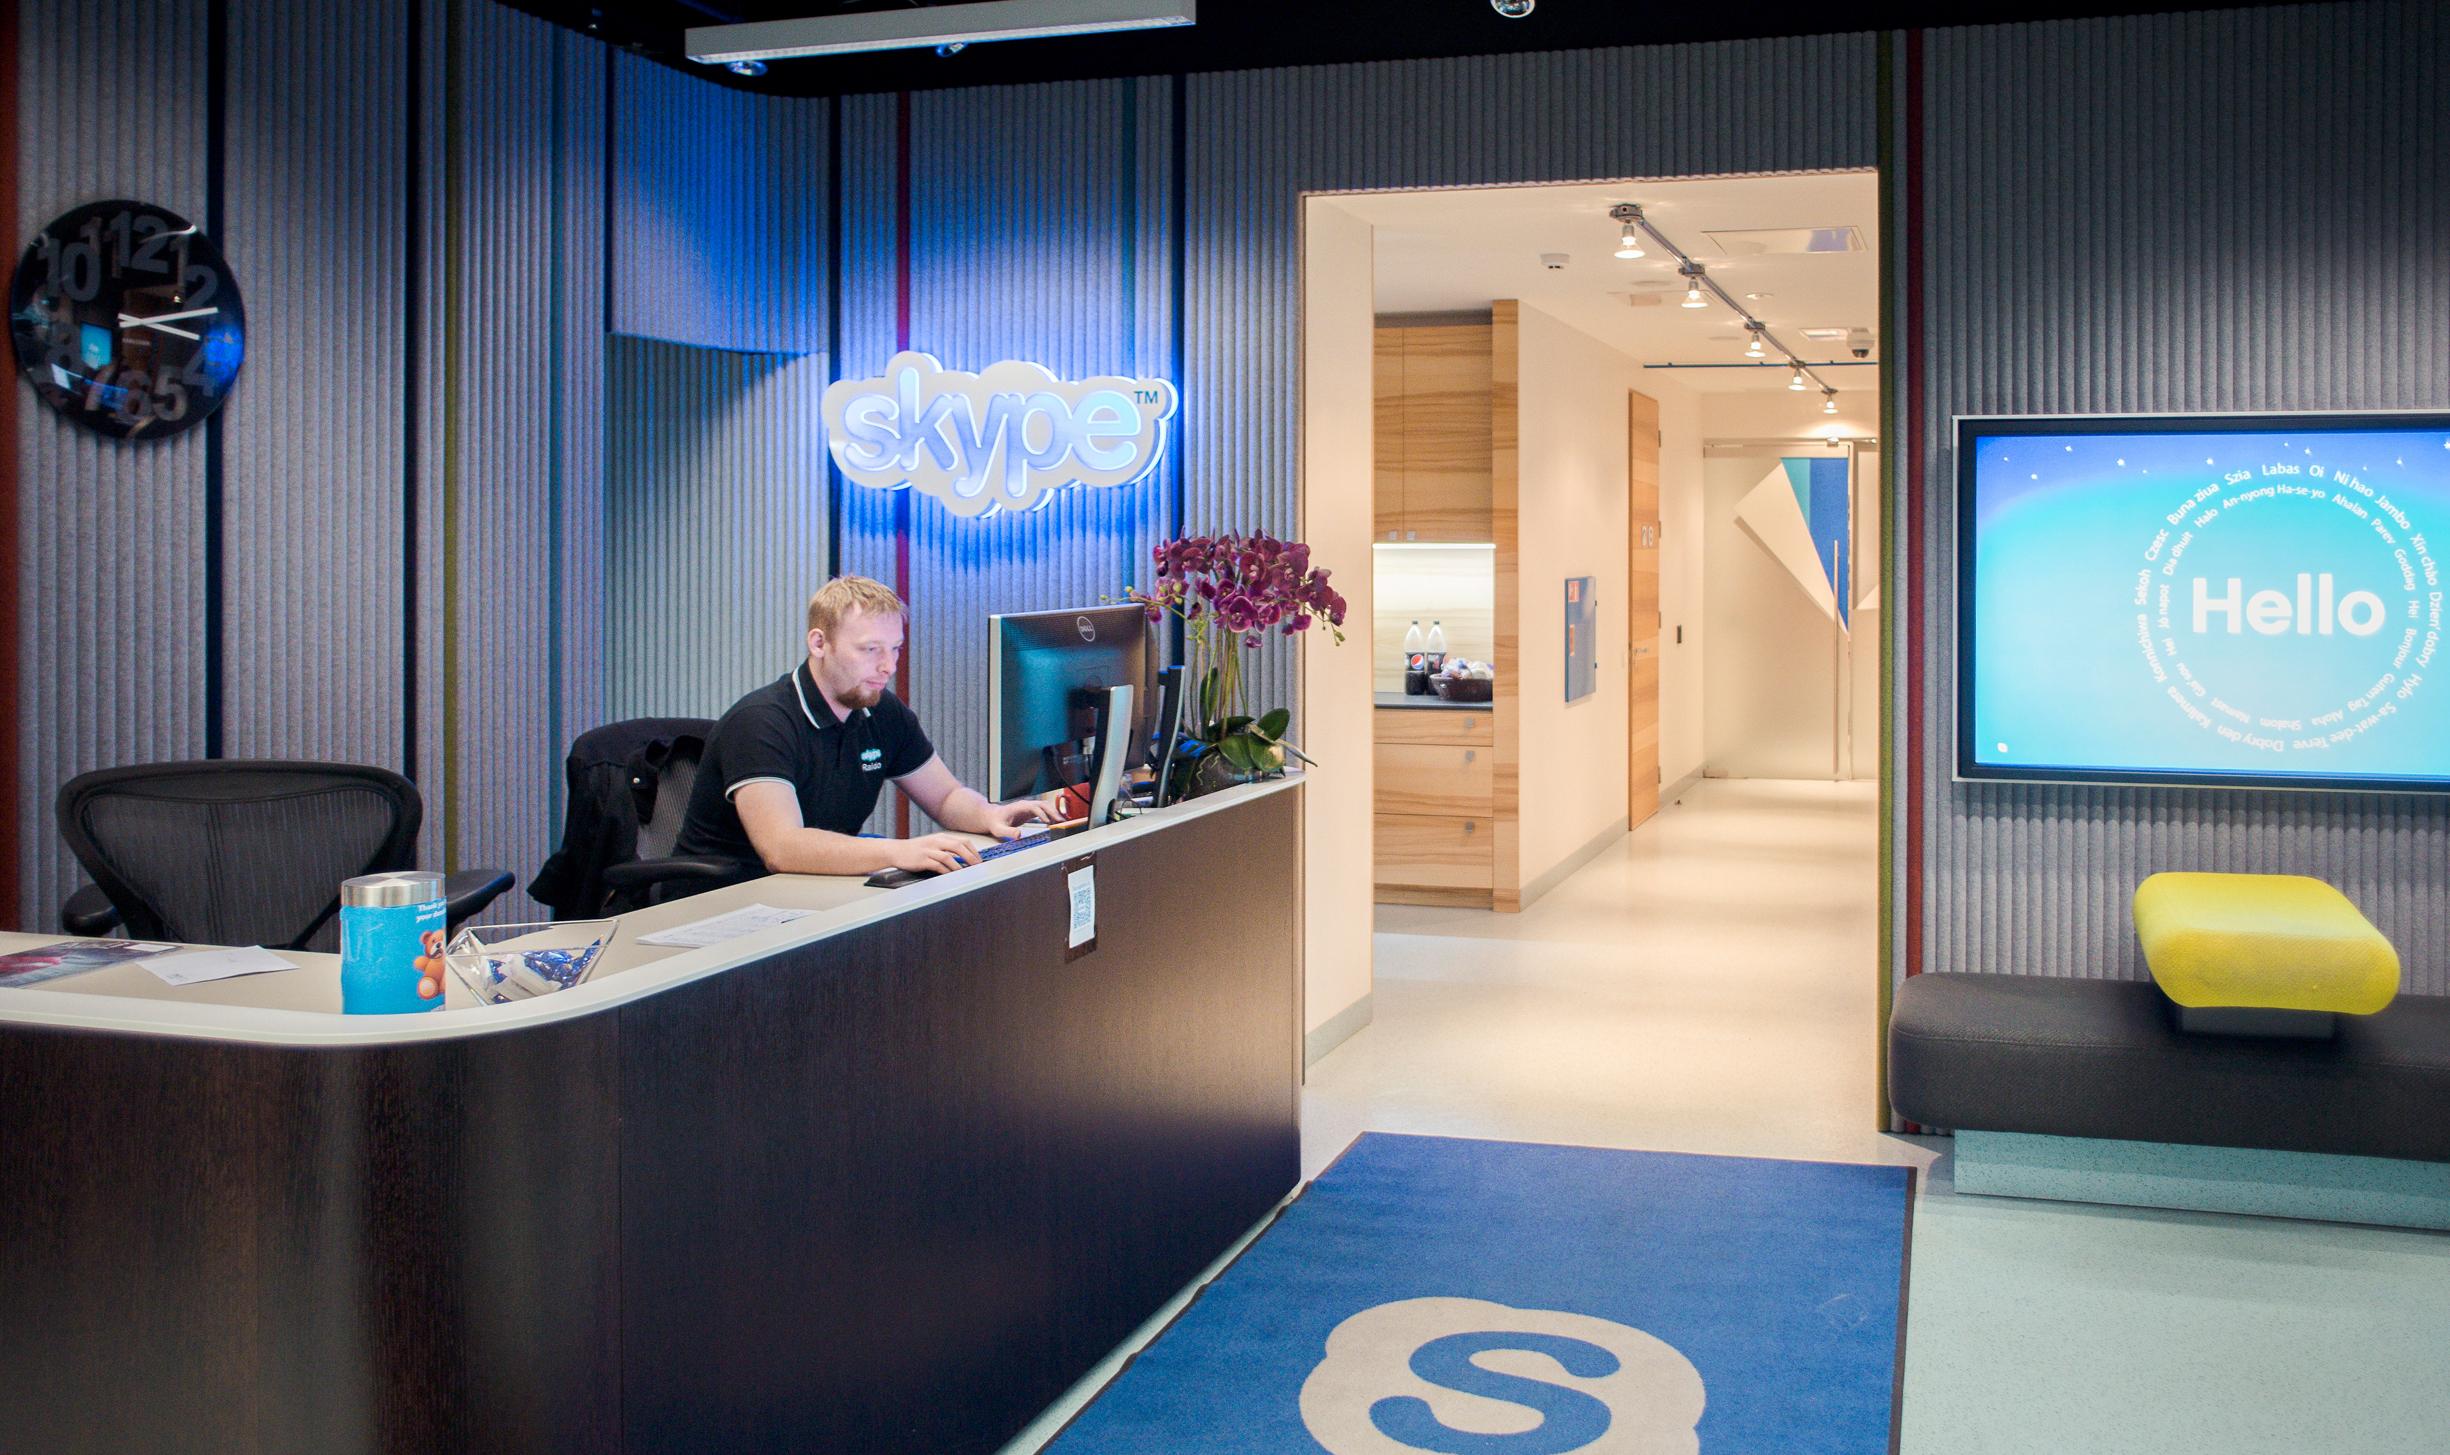 Skype headquarters in Tallinn, Estonia.